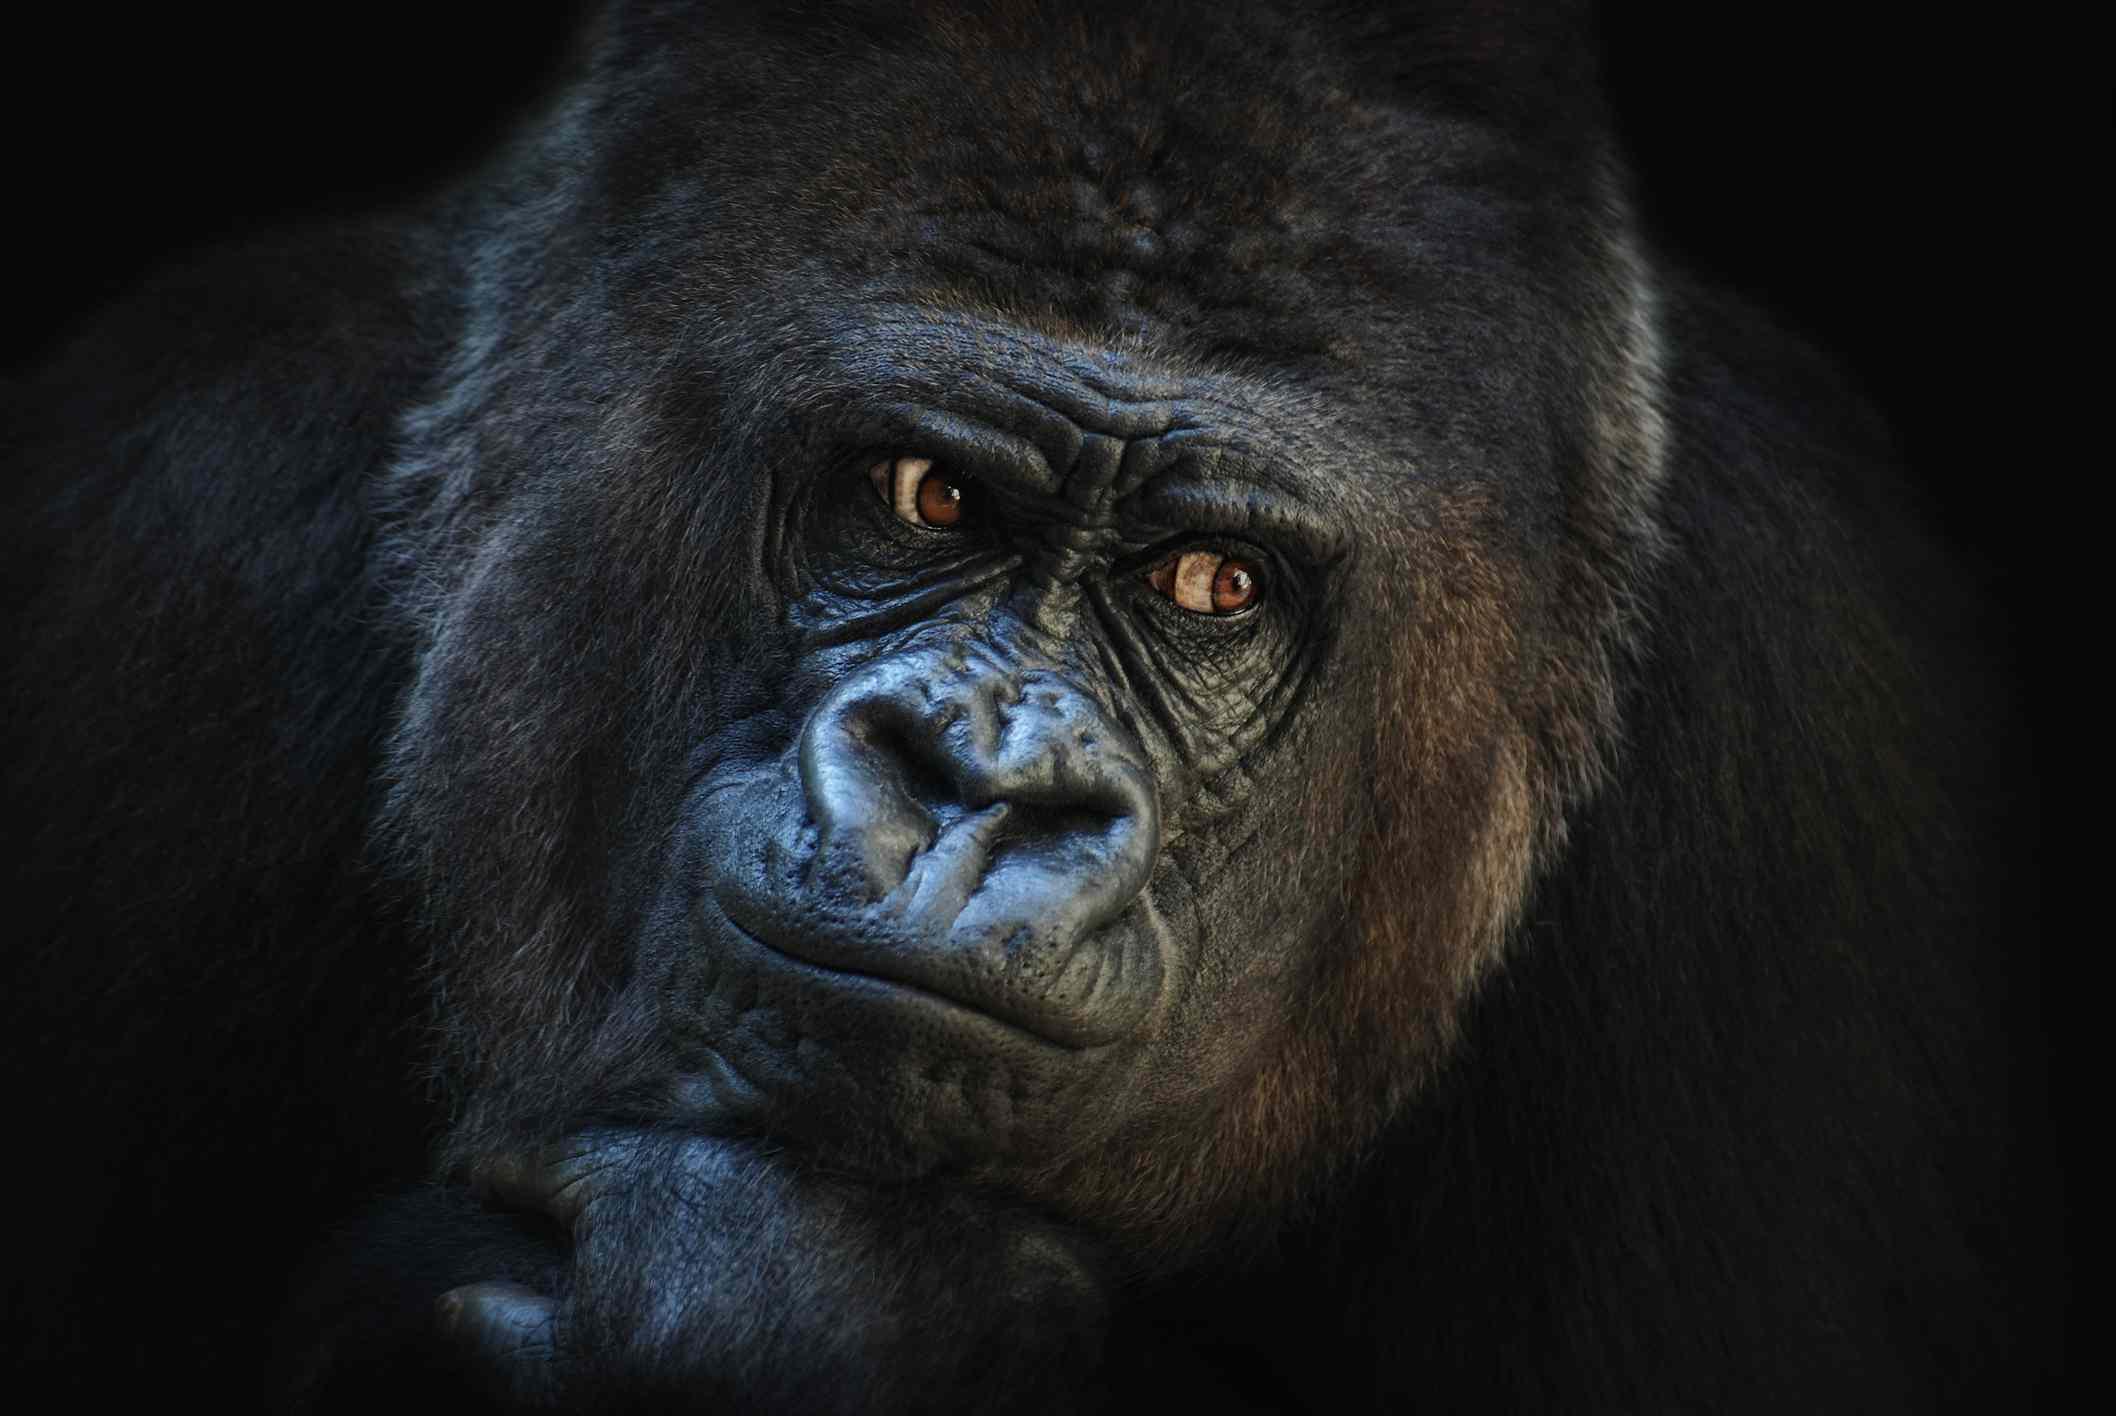 A close up of a gorilla.